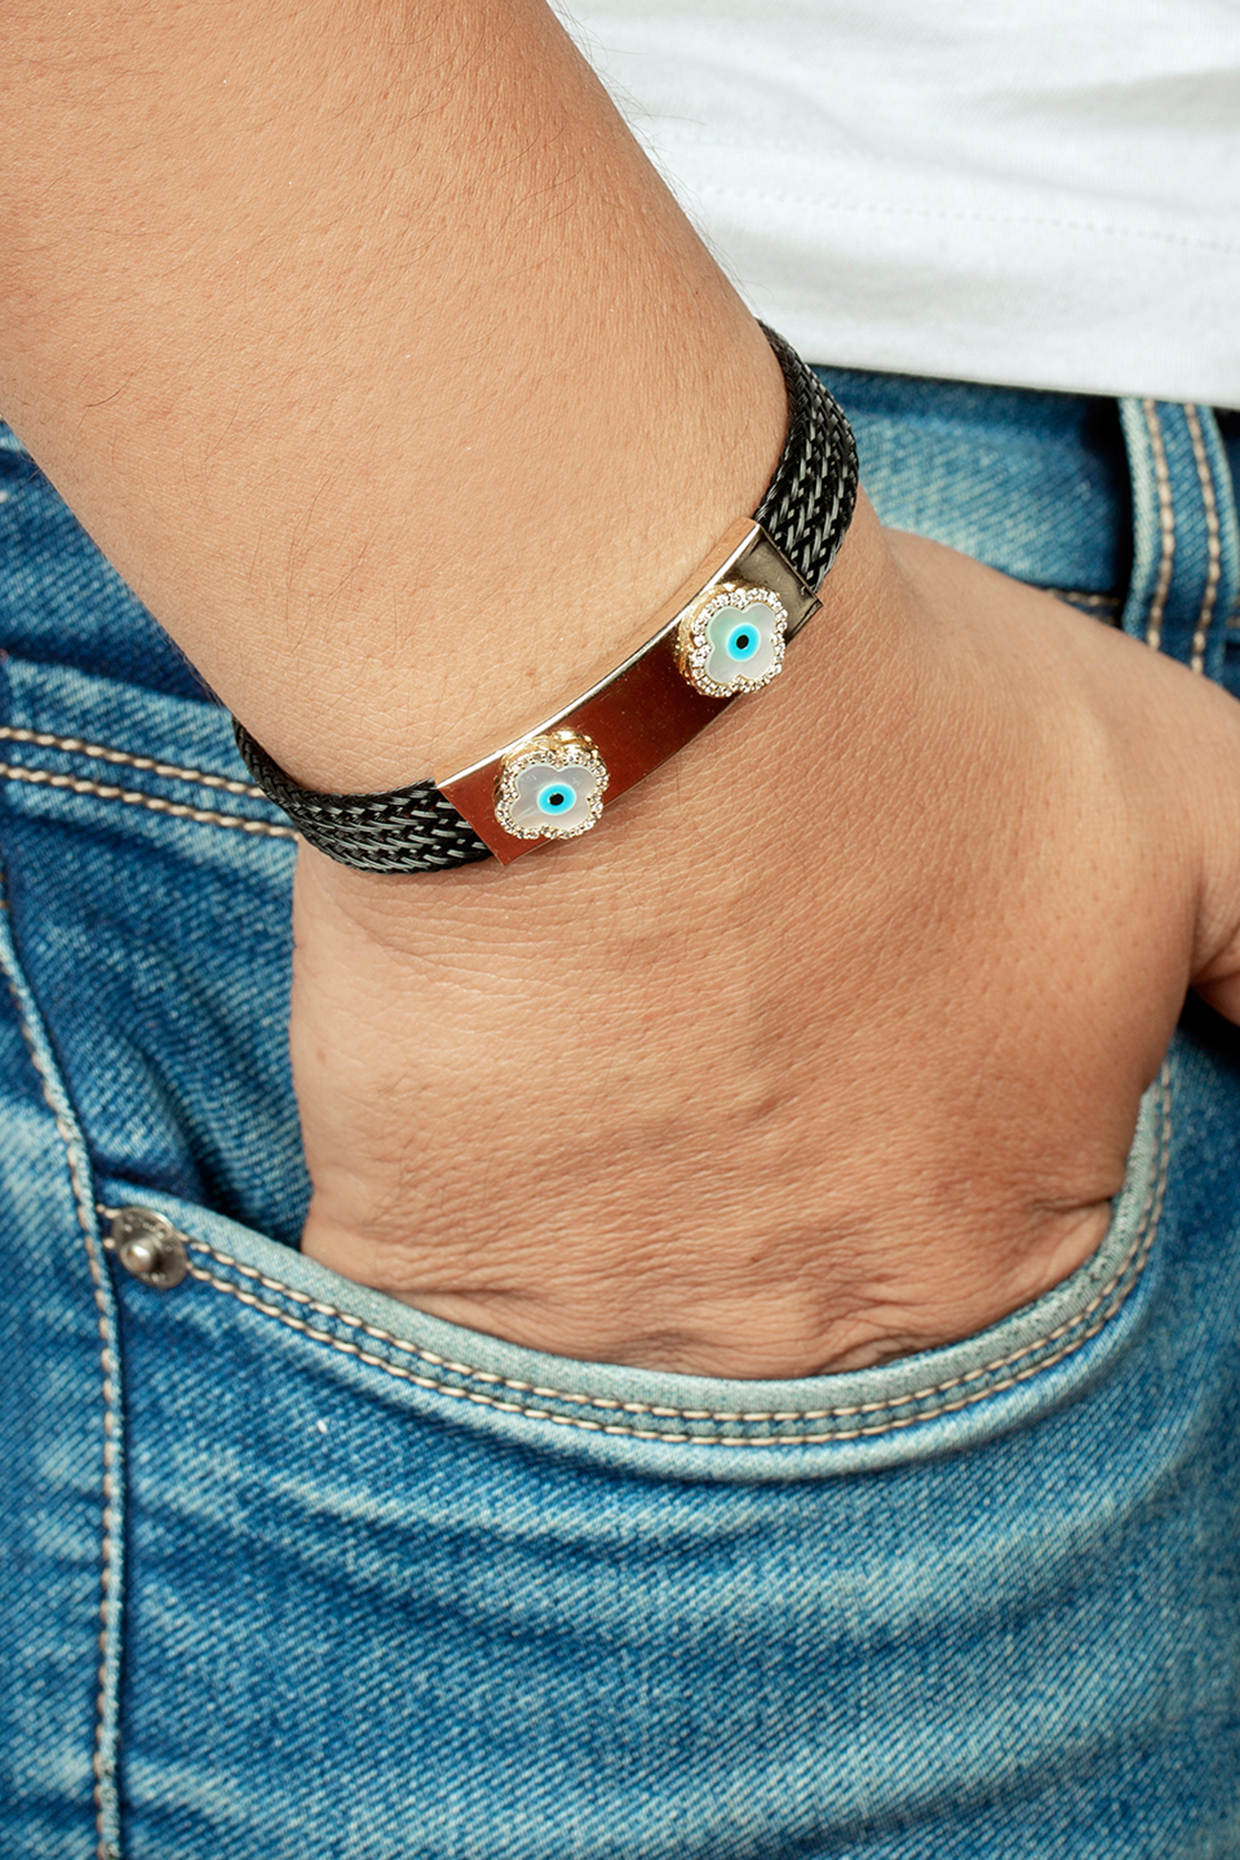 Black Evil Eye Bracelet by Joules By Radhika